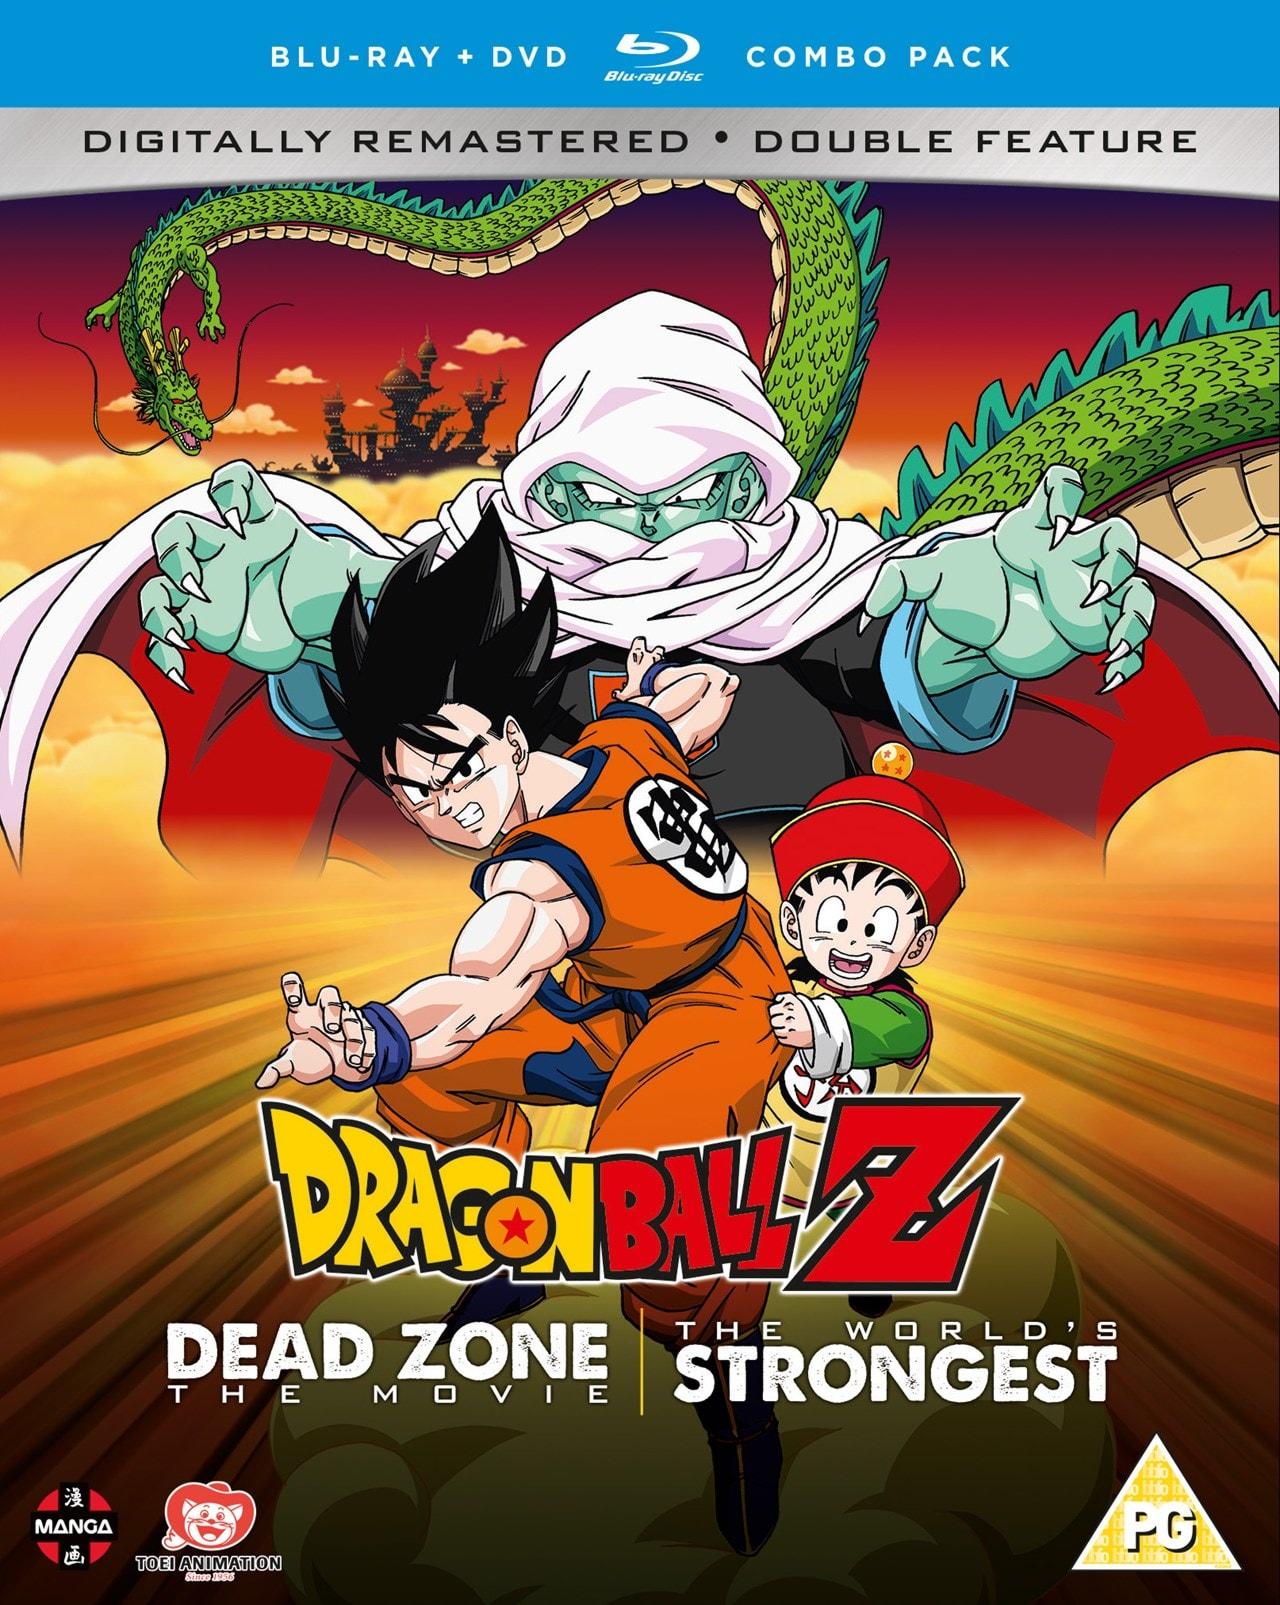 Dragonball Z: Dead Zone/The World's Strongest - 1